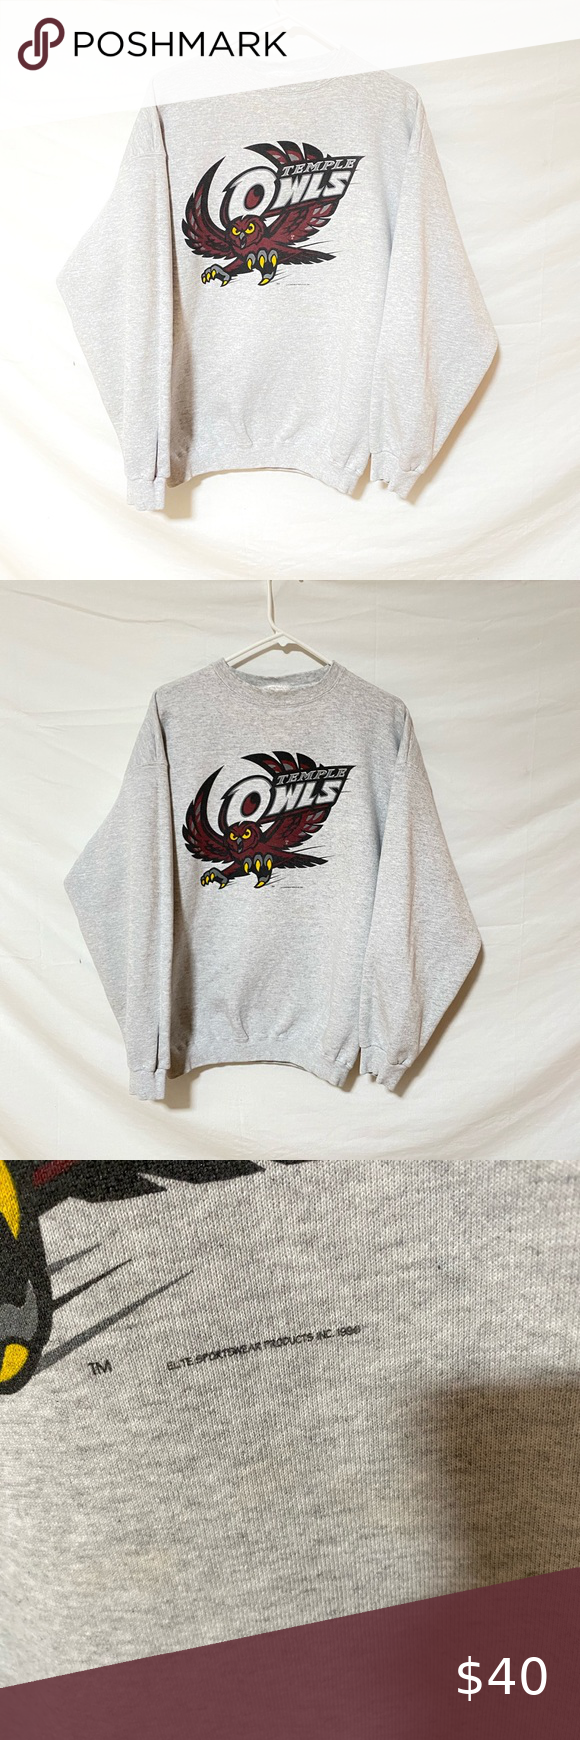 1996 Temple Owls Crewneck 90s Streetwear Vintage Sweatshirt Tie Dye Disney [ 1740 x 580 Pixel ]